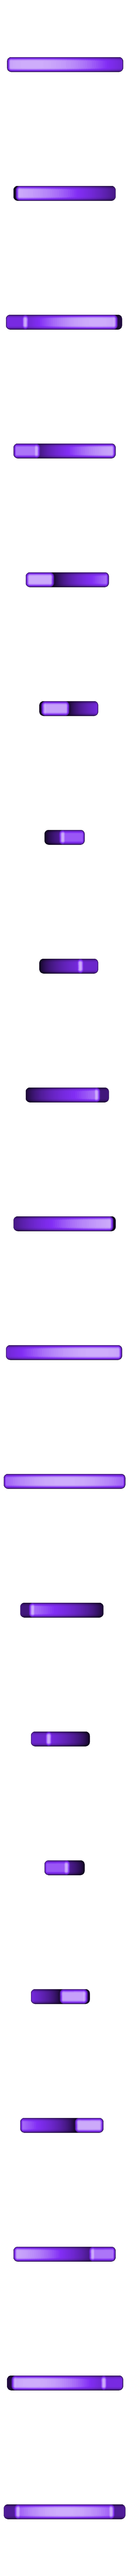 Gaggia_blocker_30.stl Download free STL file Gaggia MDF stepless mod • 3D print template, touchthebitum